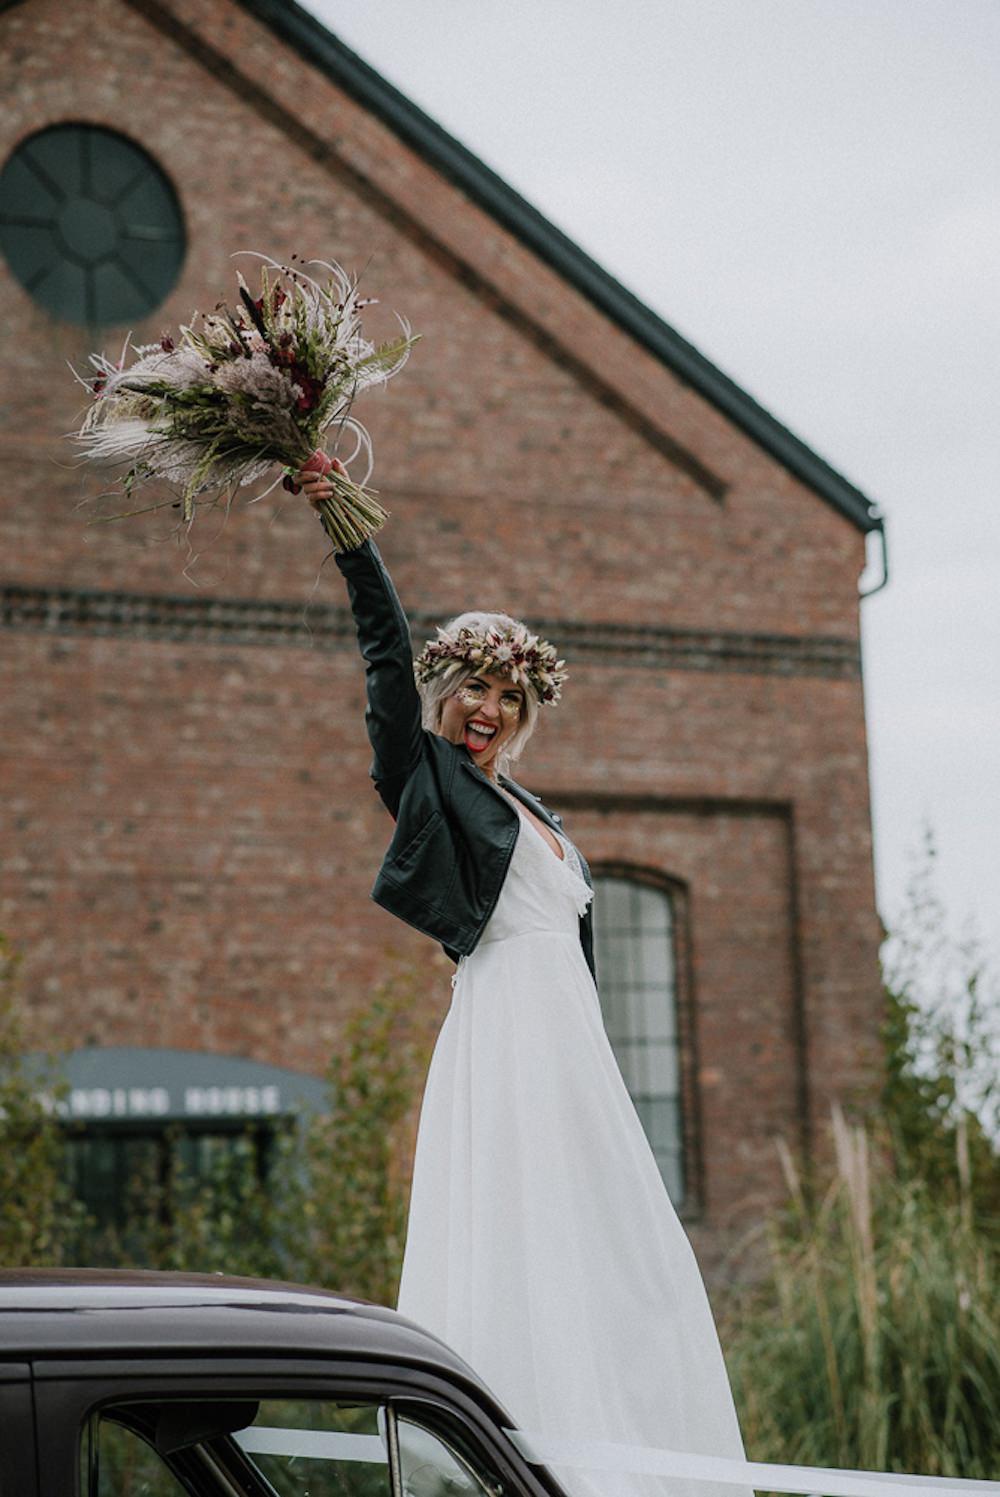 Bride Bridal Dress Gown Lace Back Lisa Lyons Leather Jacket Unconventional Wedding Ideas Pierra G Photography